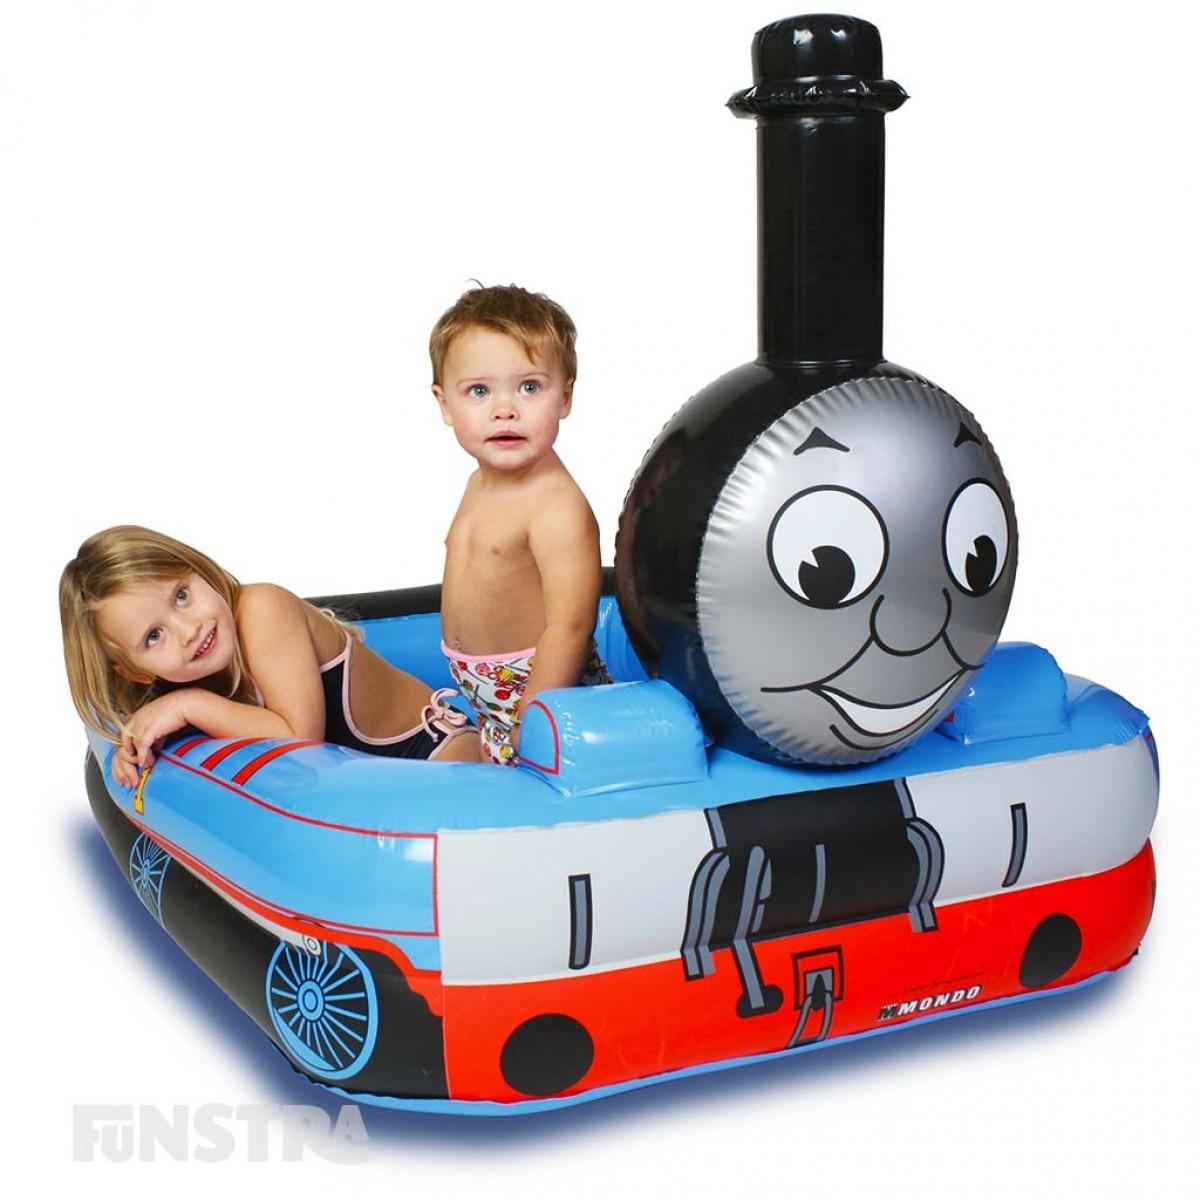 Thomas And Friends  Swimming Pool Thomas The Tank Engine